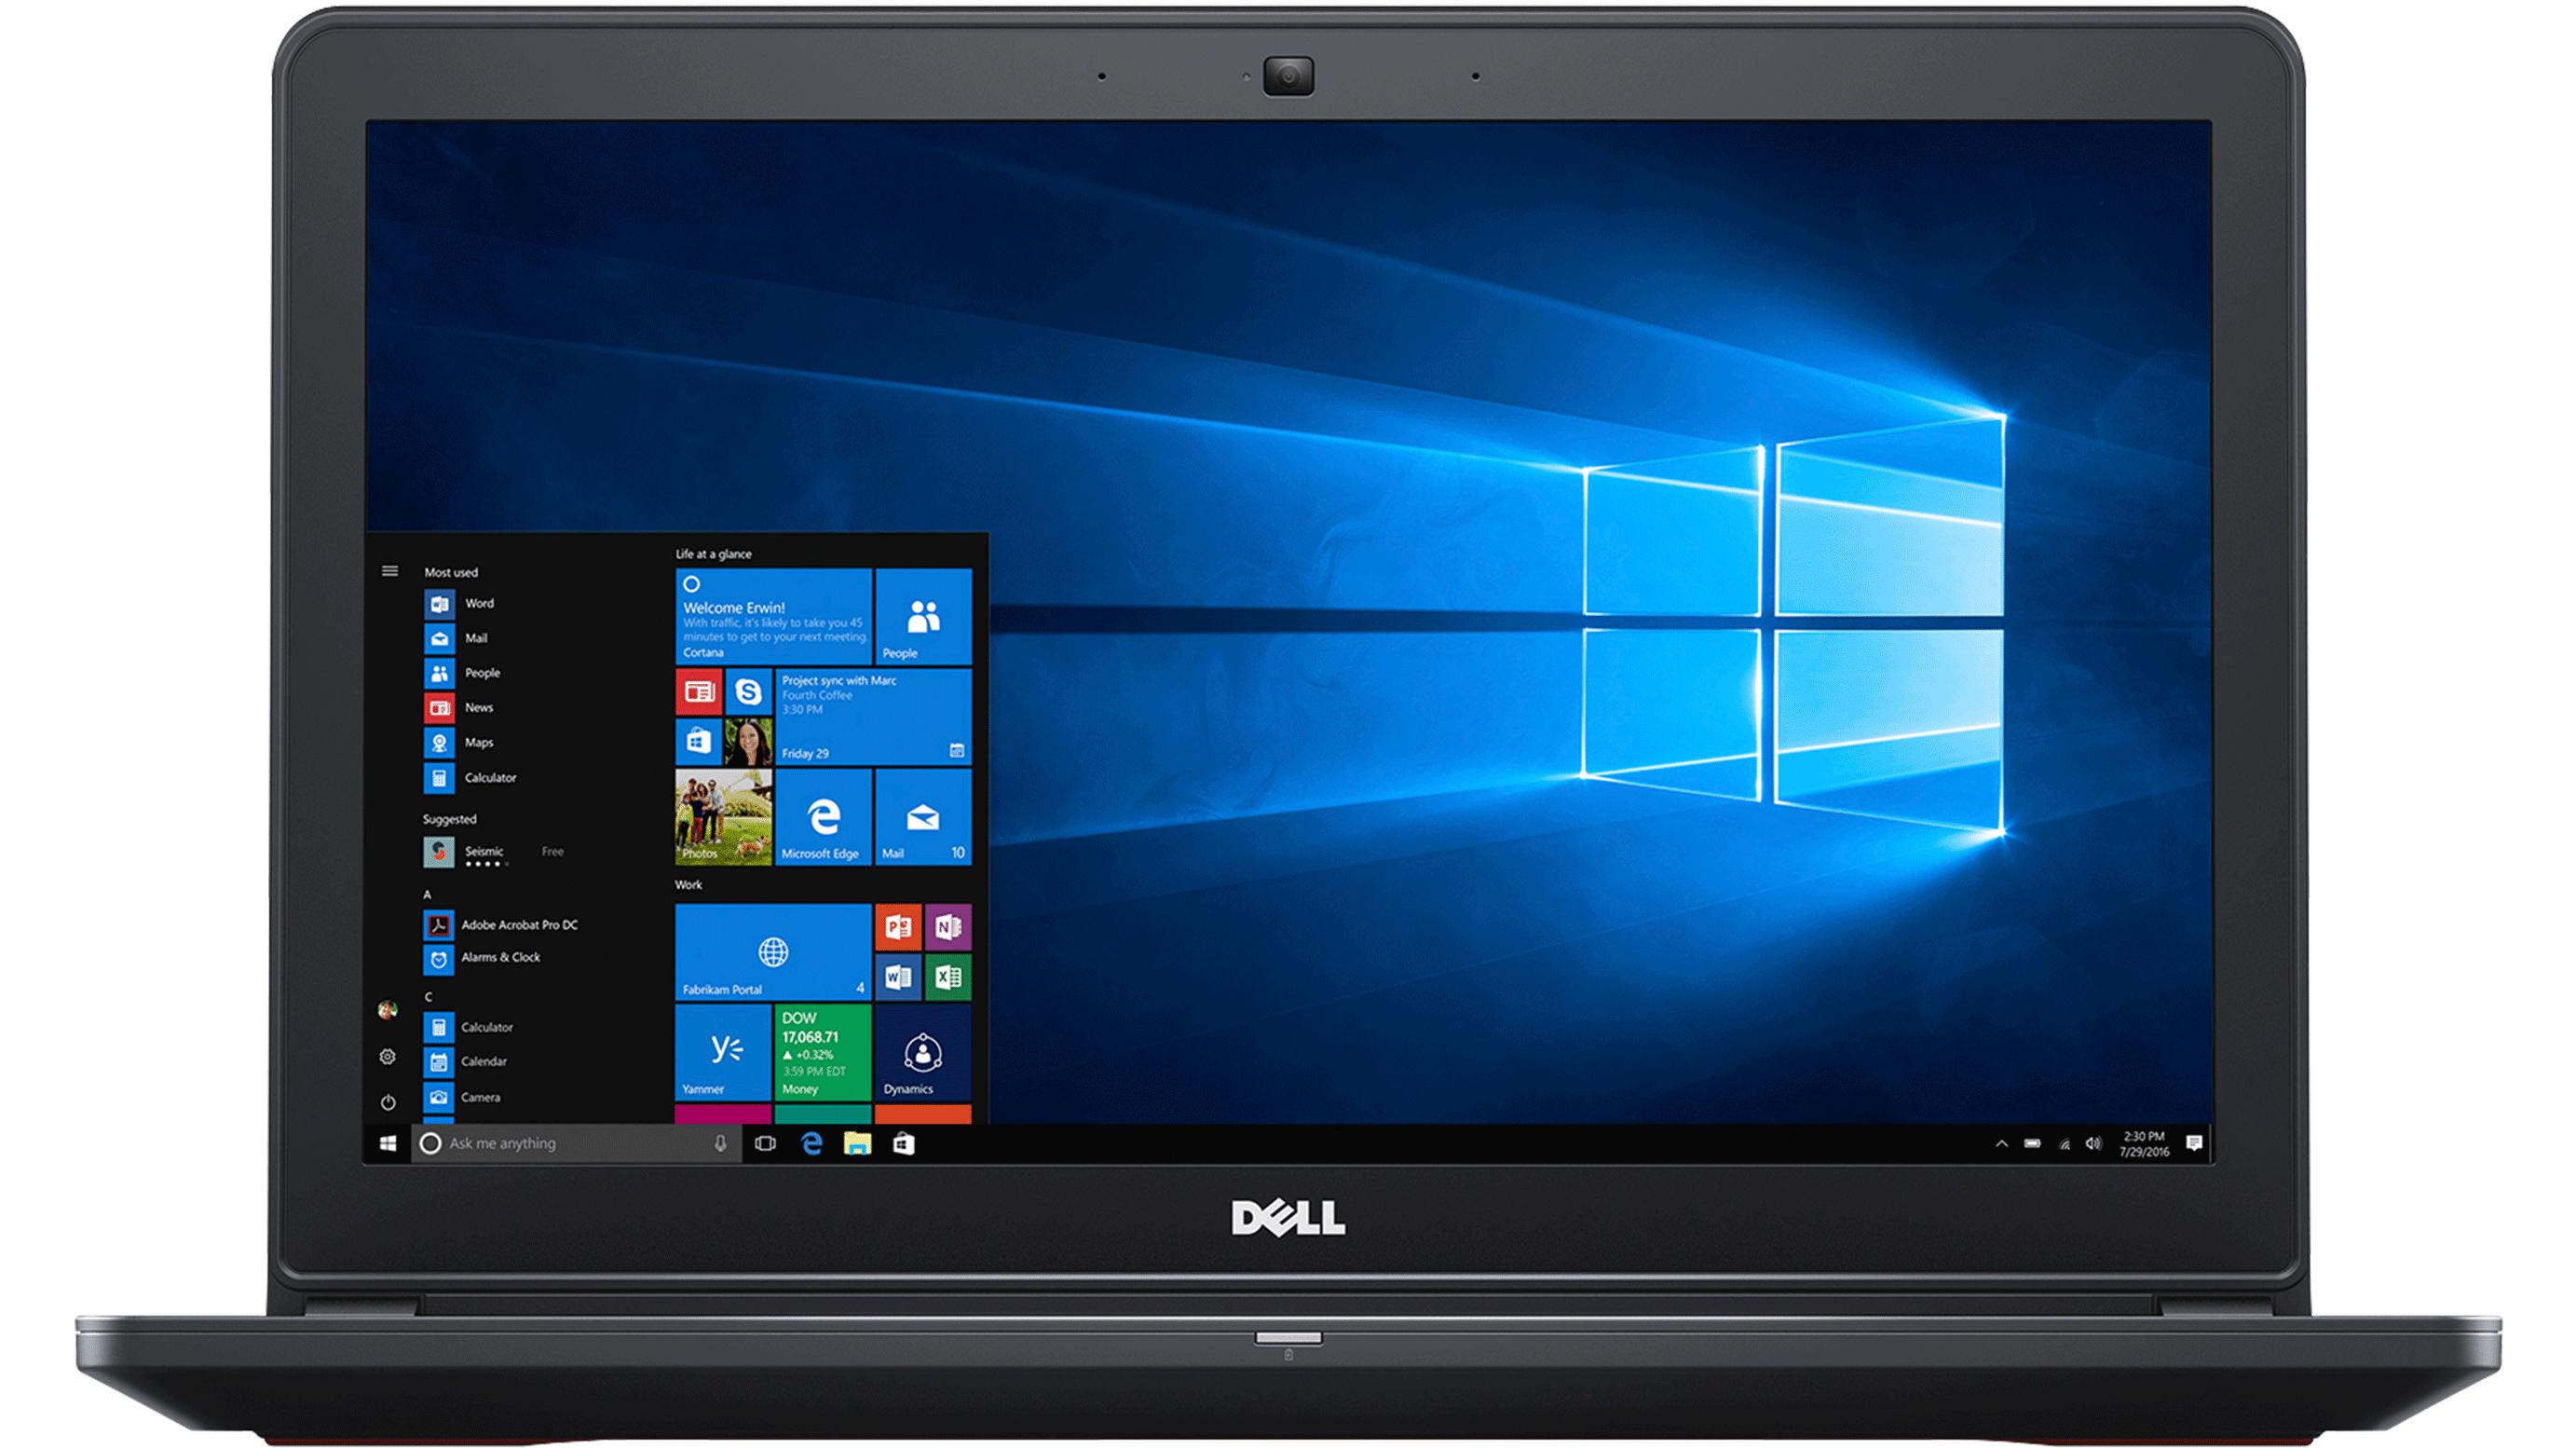 Dell Inspiron 15 i5577-5858BLK-PUS Gaming Laptop• 15.6-inch Full HD display • Intel i5 7th Gen • 8GB memory/1TB HDD • NVIDIA GeForce GTX 1050 graphics